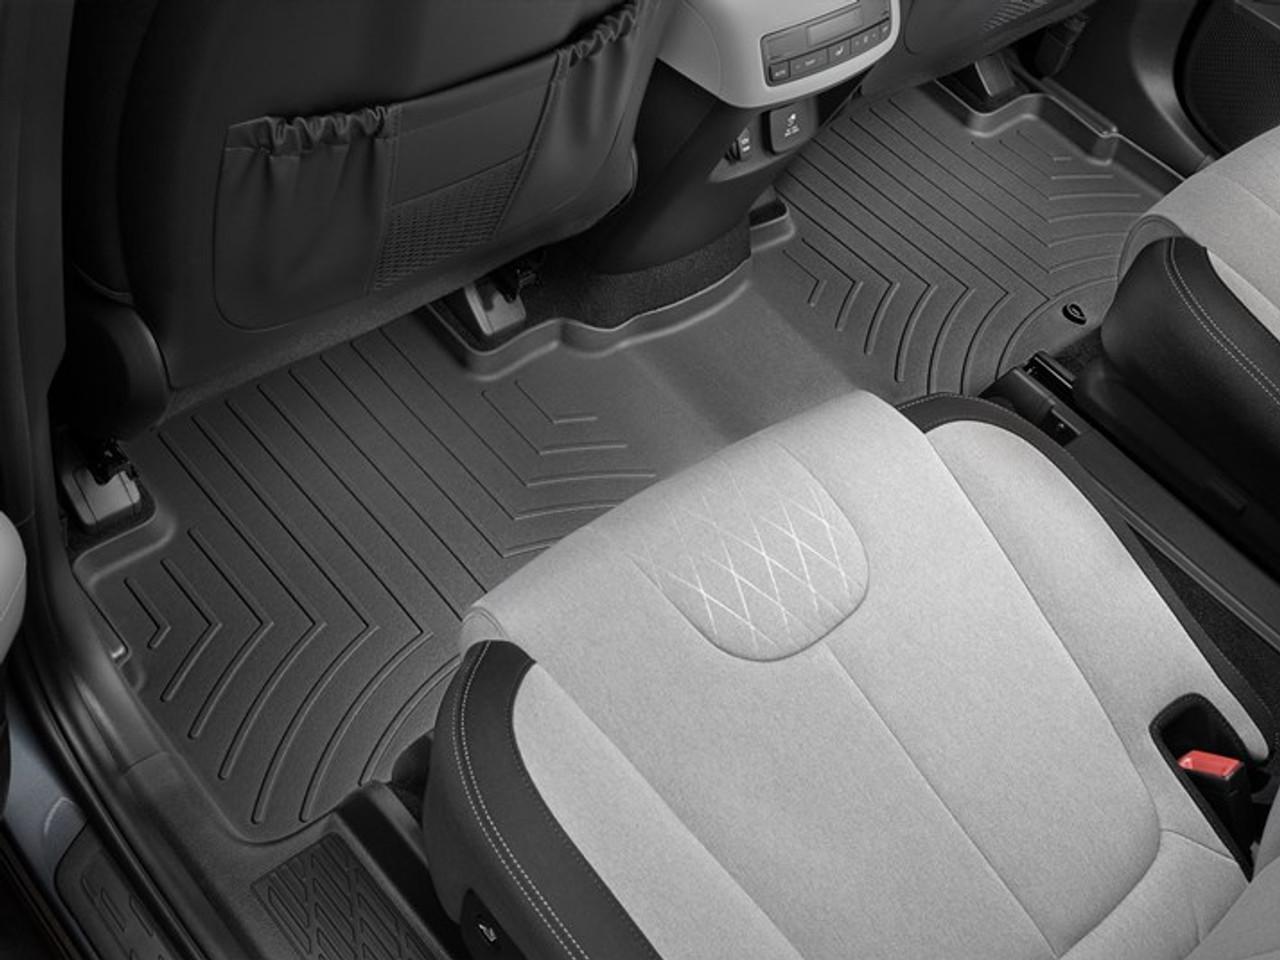 2020-2022 Hyundai Palisade WeatherTech Floor Liners - Second Row (Black)